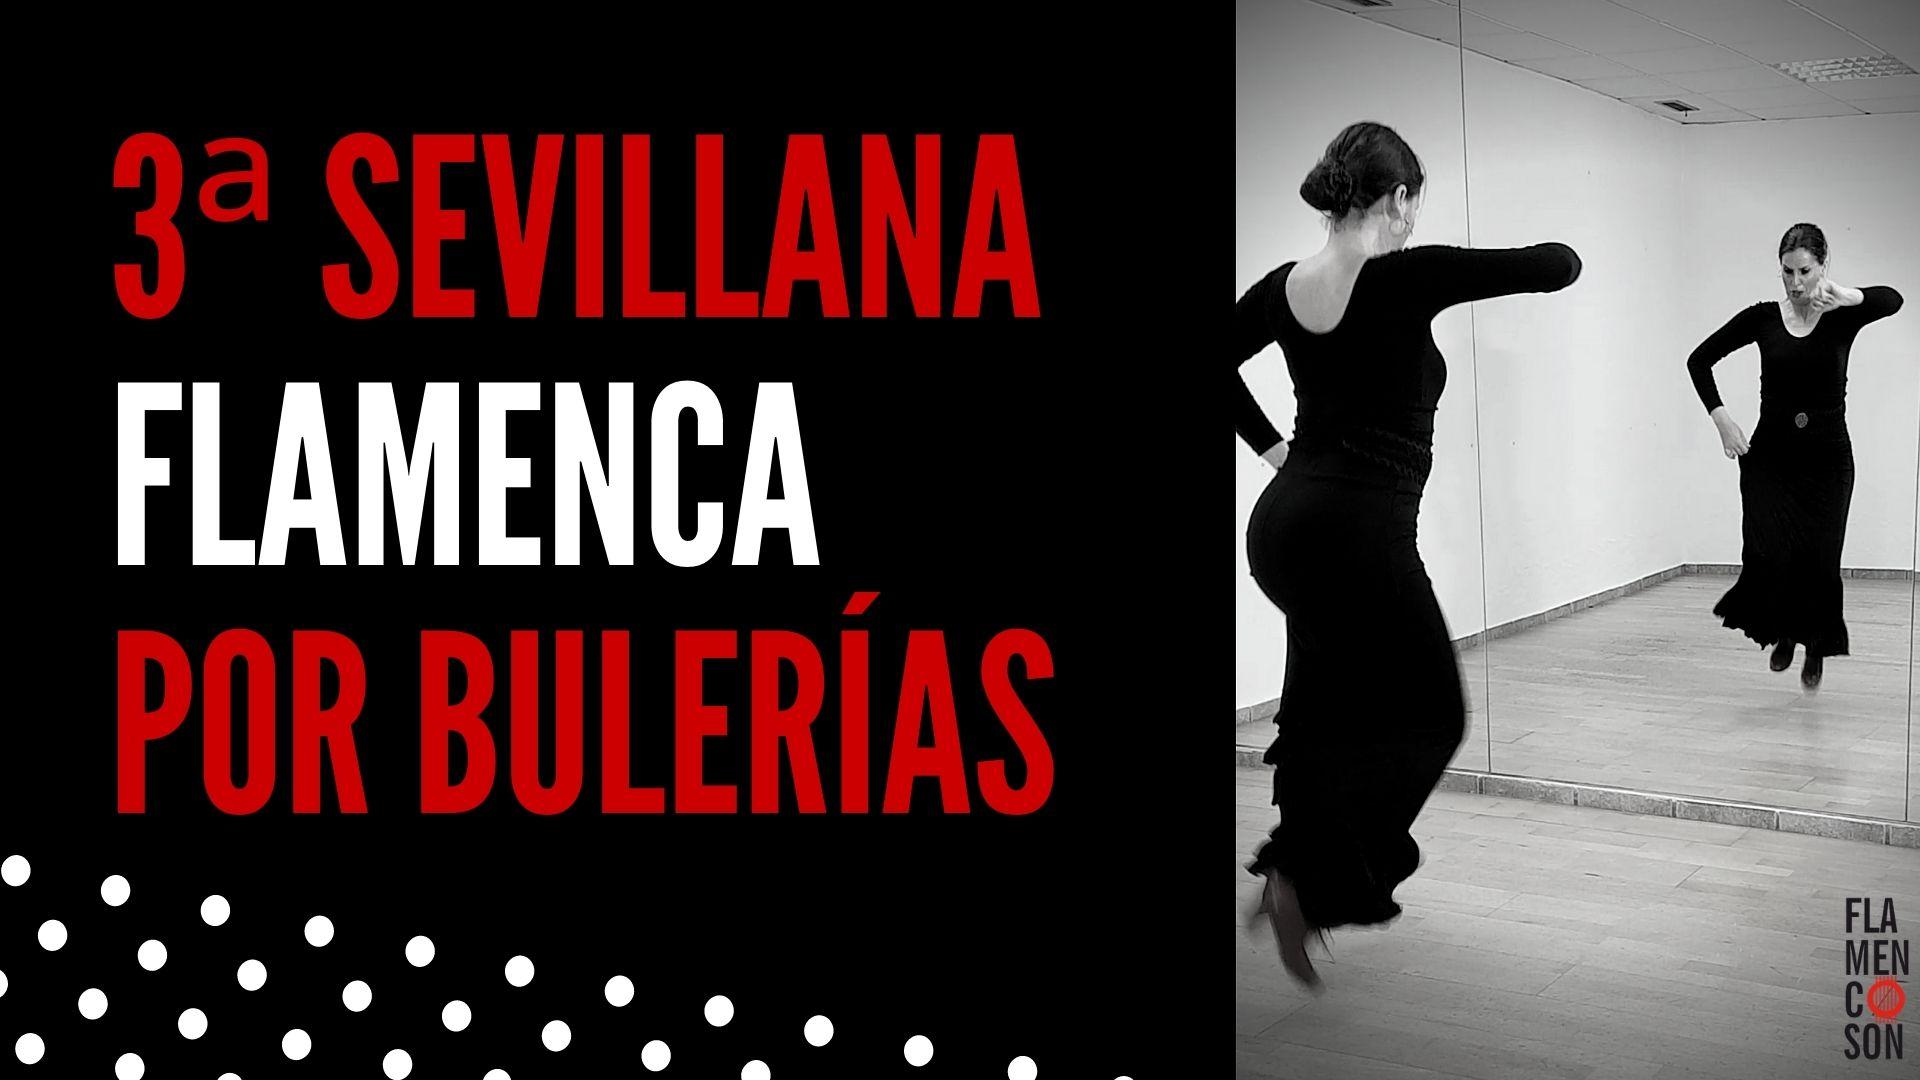 Tercera sevillana flamenca por bulerias